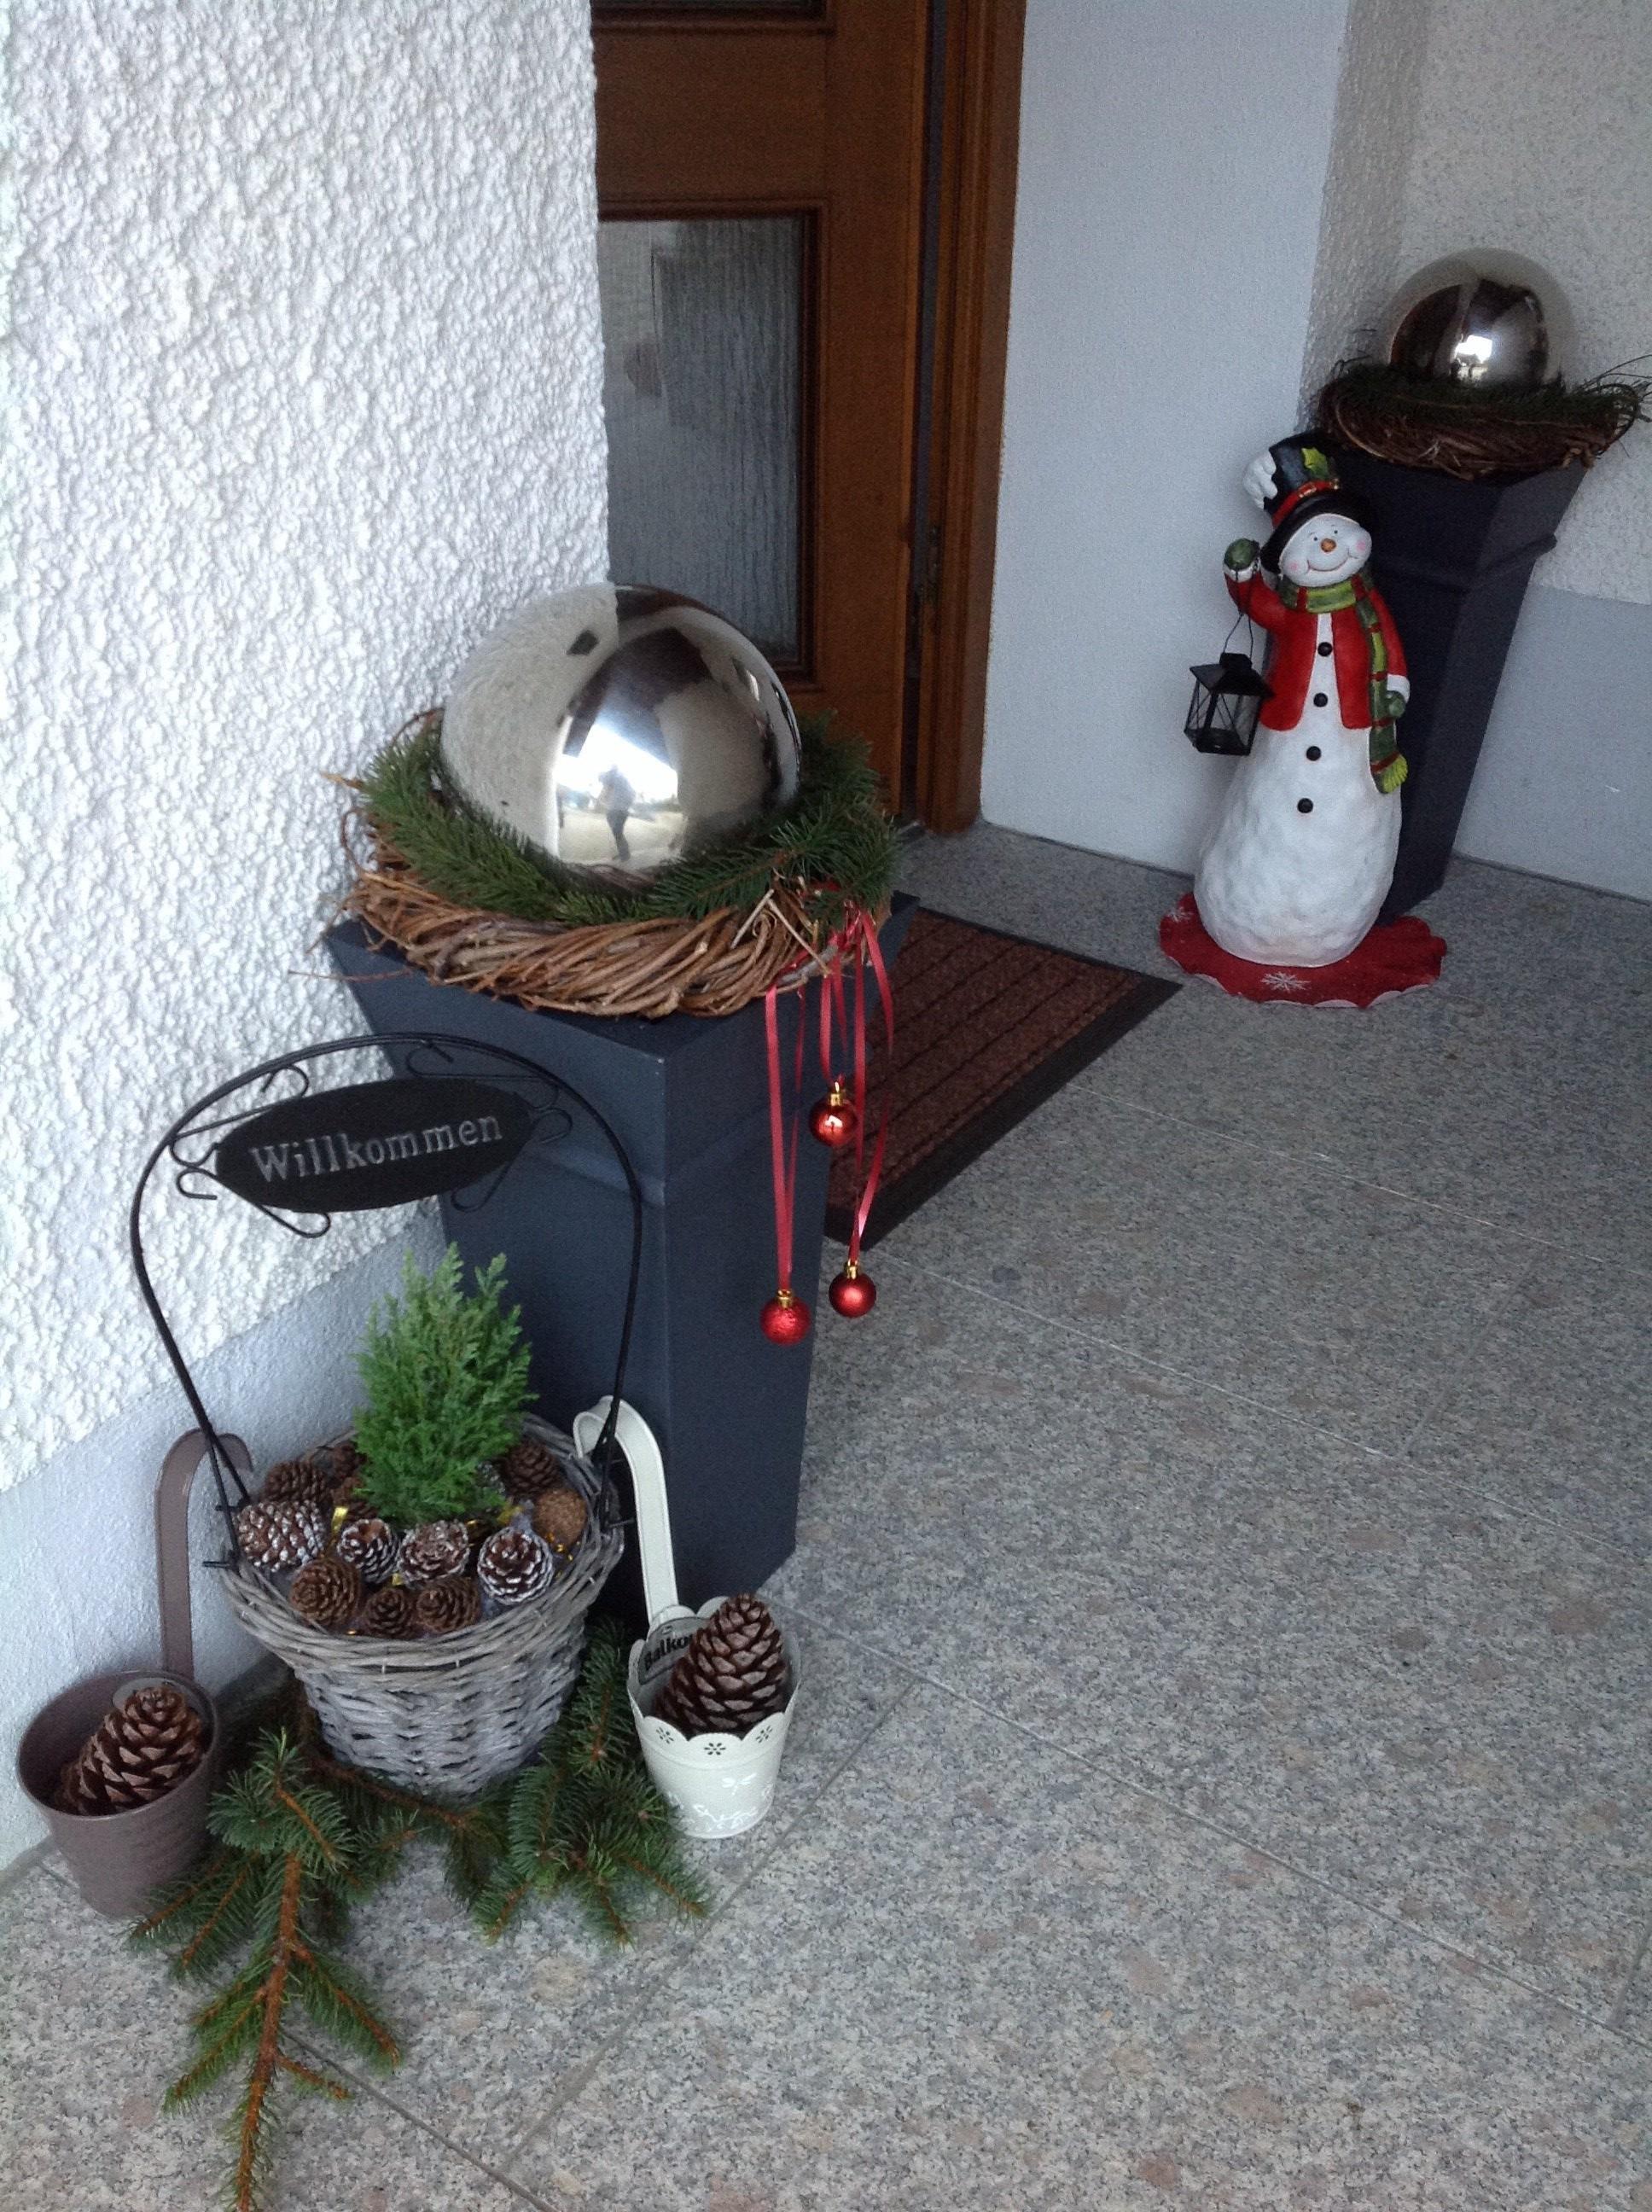 deko 39 weihnachtsdeko drau en 39 unser geschenktes eigentum danke omii zimmerschau. Black Bedroom Furniture Sets. Home Design Ideas